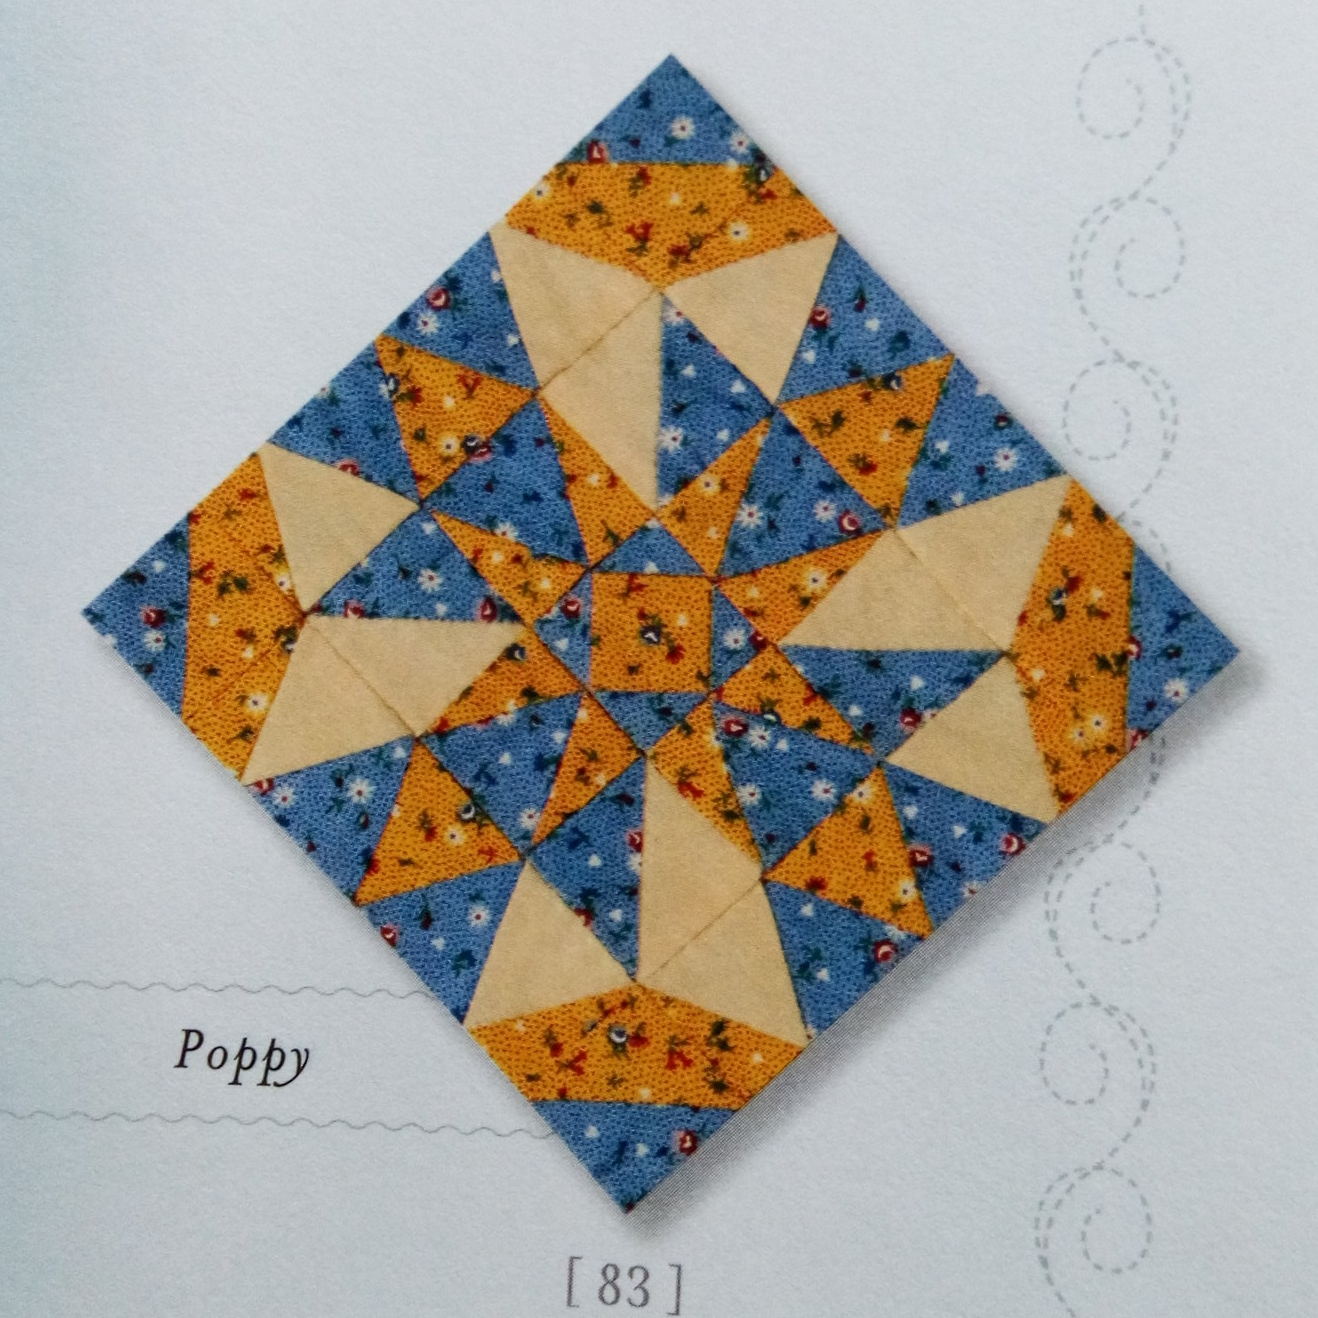 Poppy: Coming May 11